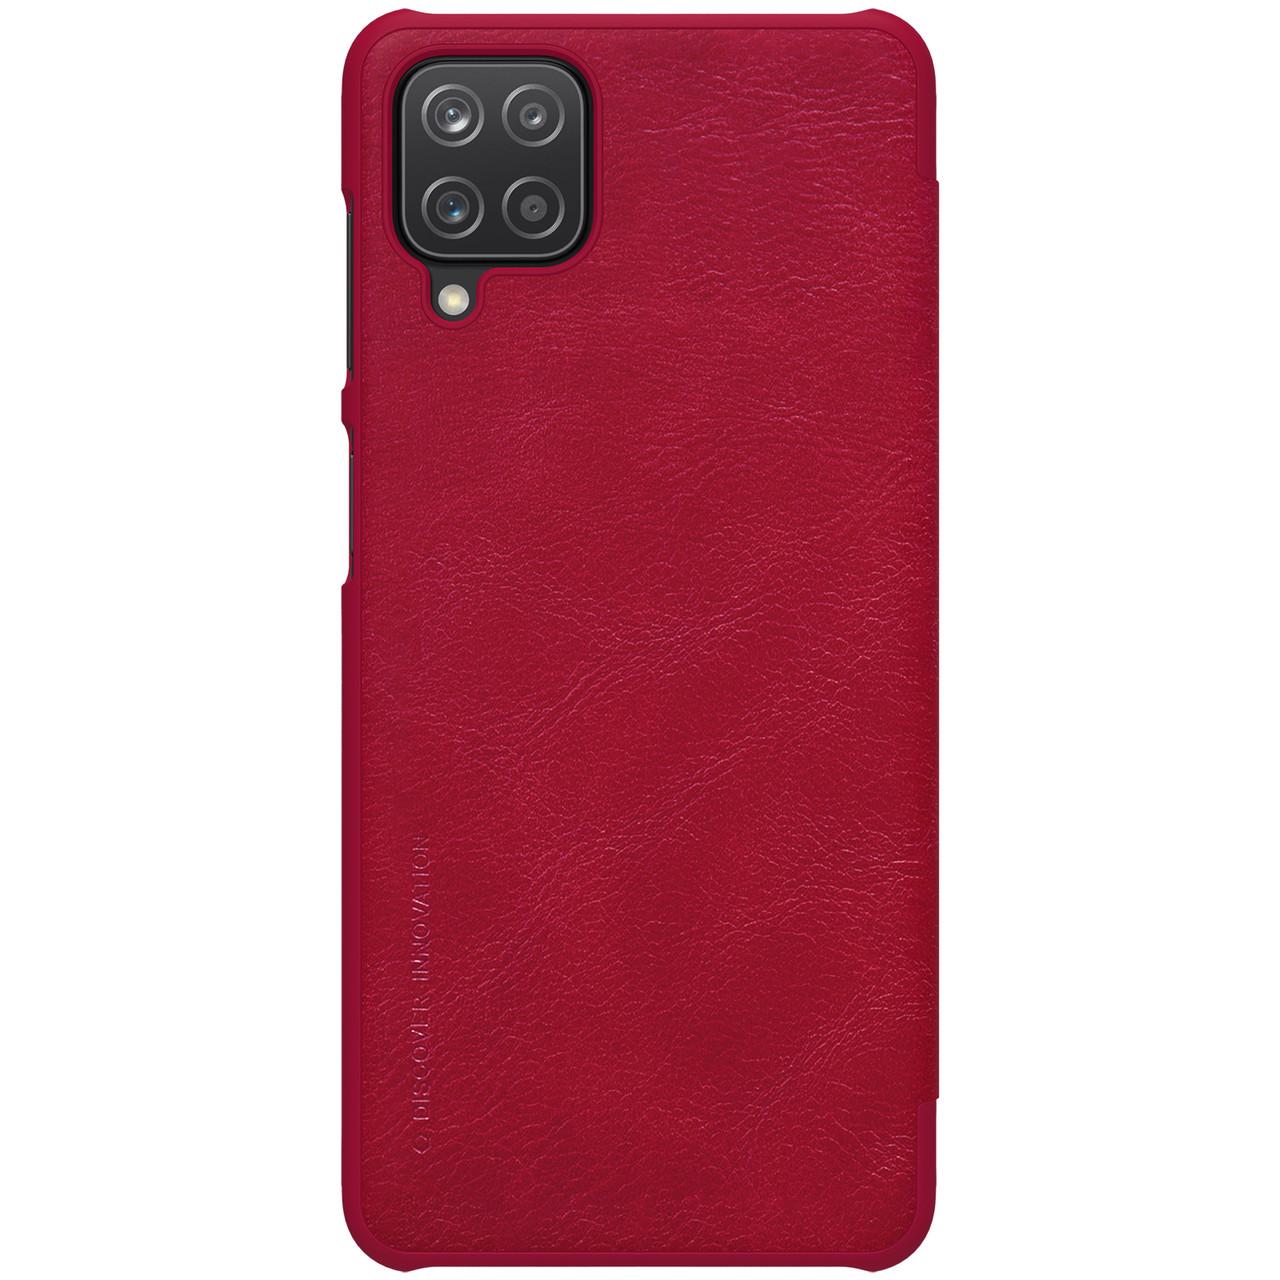 Защитный чехол-книжка Nillkin для Samsung Galaxy A12 (Qin leather case) Red Красный